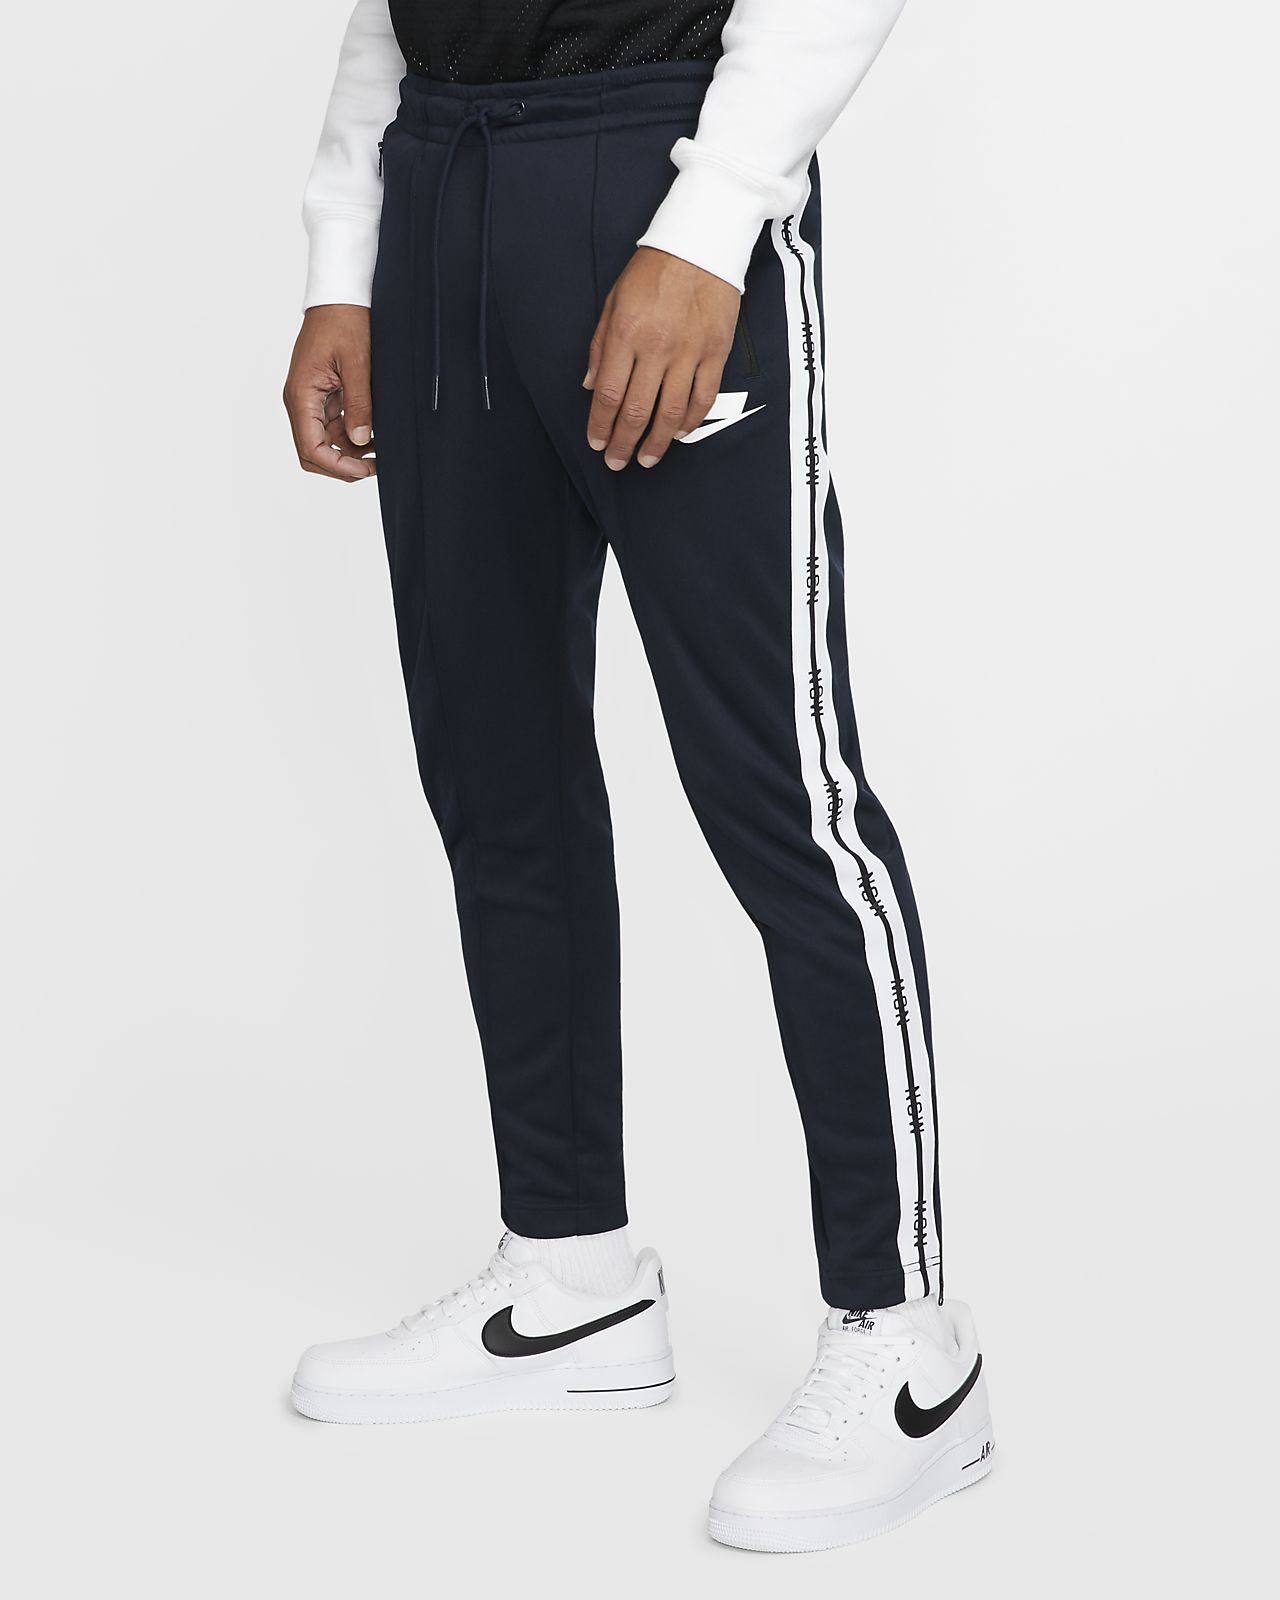 1df6d15e Low Resolution Брюки Nike Sportswear NSW Брюки Nike Sportswear NSW